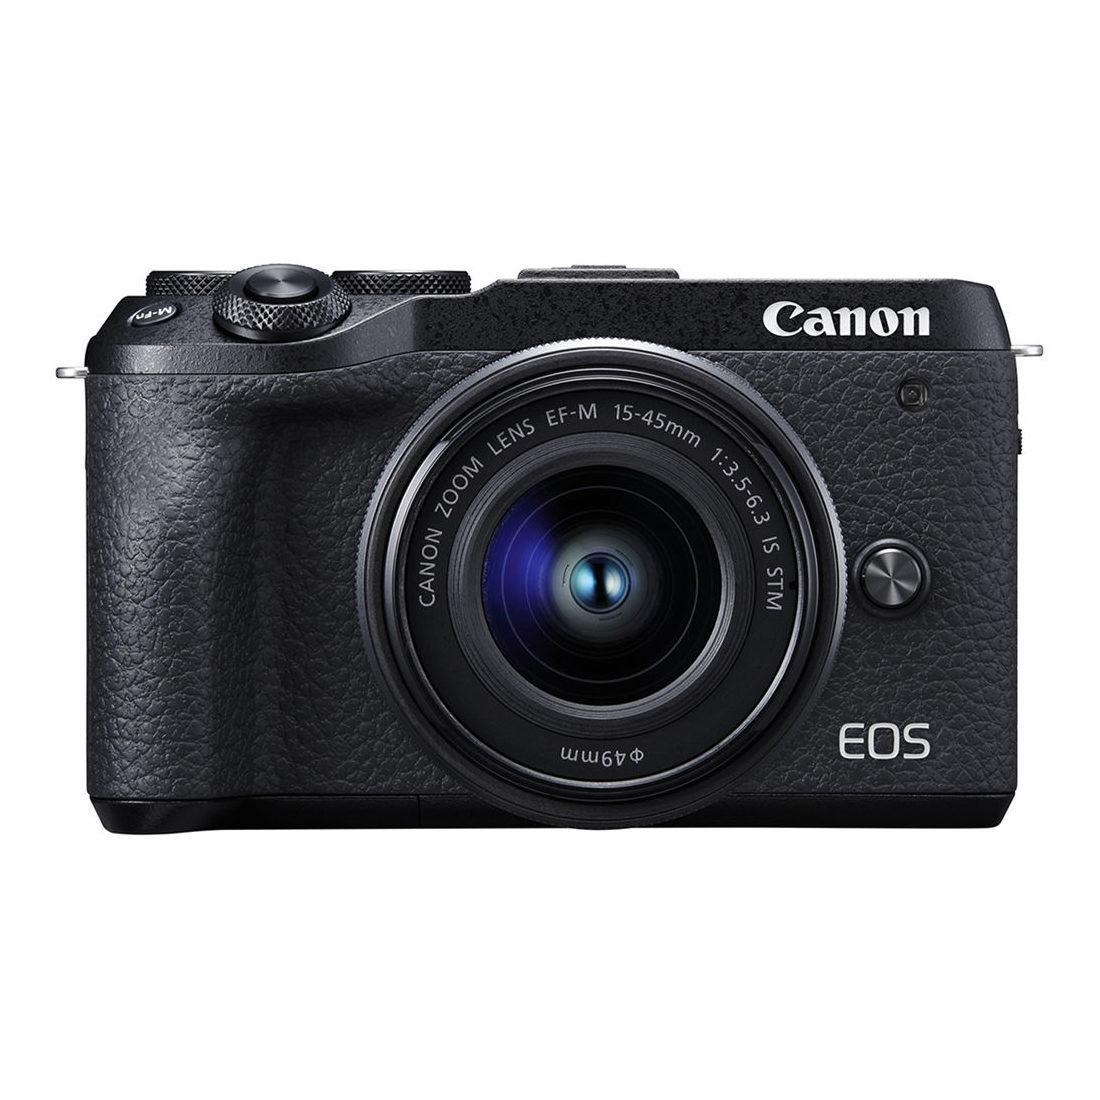 Canon EOS M6 Mark II systeemcamera + 15-45mm + EVF-DC2 <br/>€ 1098.00 <br/> <a href='https://www.cameranu.nl/fotografie/?tt=12190_474631_241358_&r=https%3A%2F%2Fwww.cameranu.nl%2Fnl%2Fp3071627%2Fcanon-eos-m6-mark-ii-systeemcamera-15-45mm-evf-dc2%3Fchannable%3De10841.MzA3MTYyNw%26utm_campaign%3D%26utm_content%3DEOS%2BM%2Bsysteemcamera%26utm_source%3DTradetracker%26utm_medium%3Dcpc%26utm_term%3DDigitale%2Bcamera%26apos%3Bs' target='_blank'>naar de winkel</a>